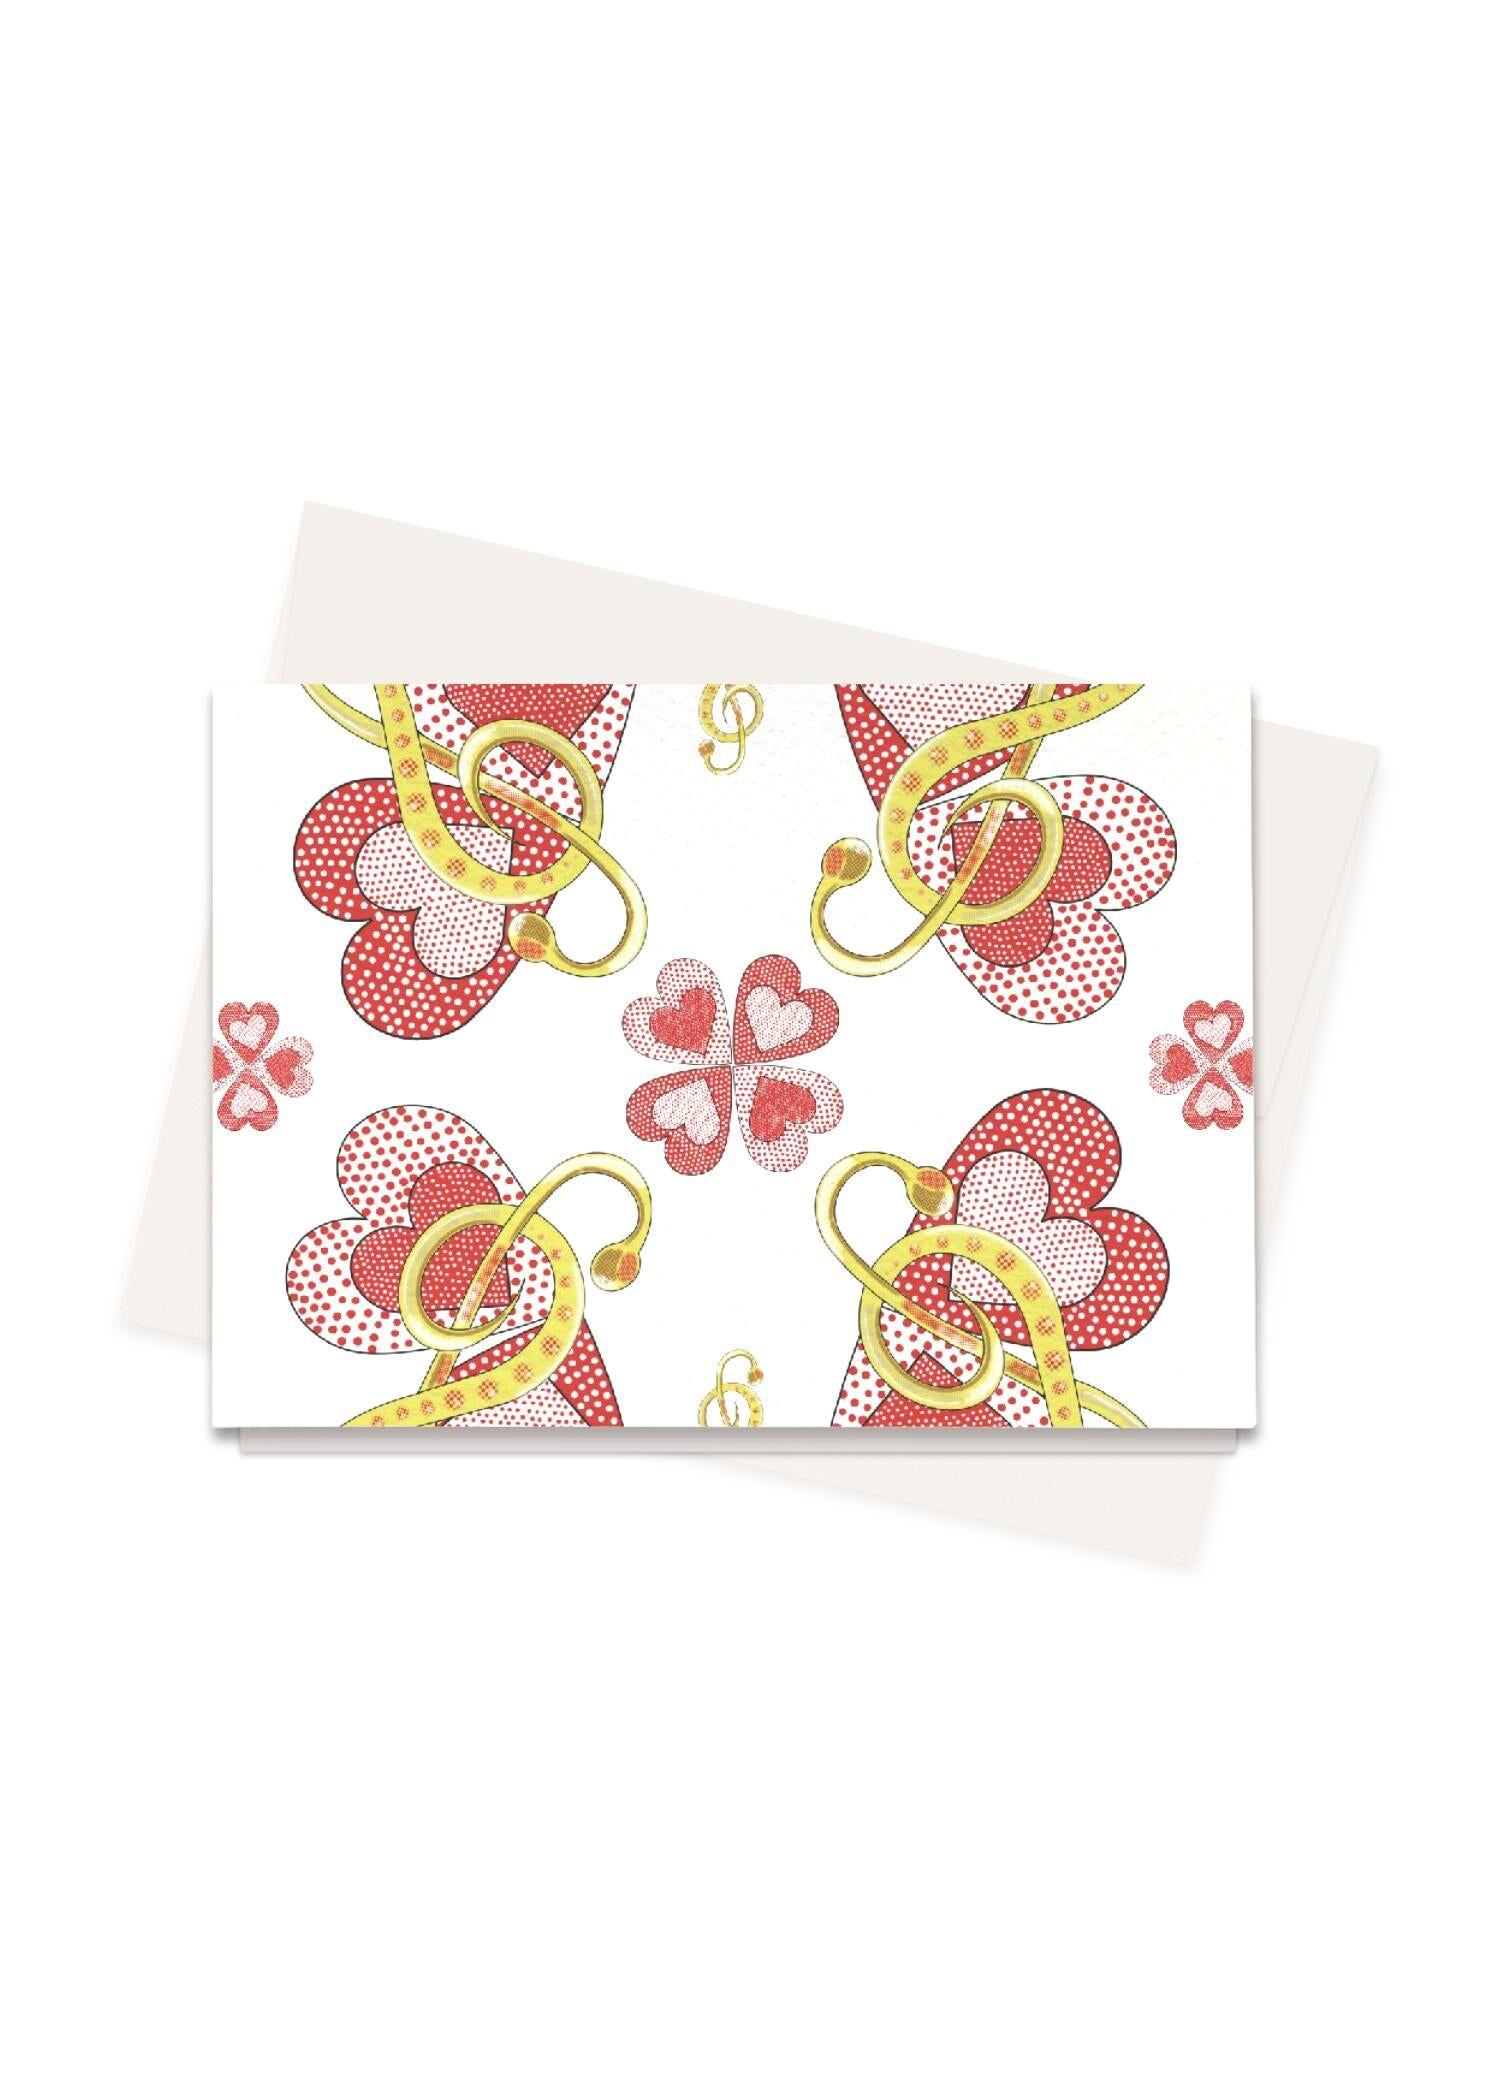 VIDA Greeting Cards Set - Music by VIDA Original Artist  - Size: Set of 8